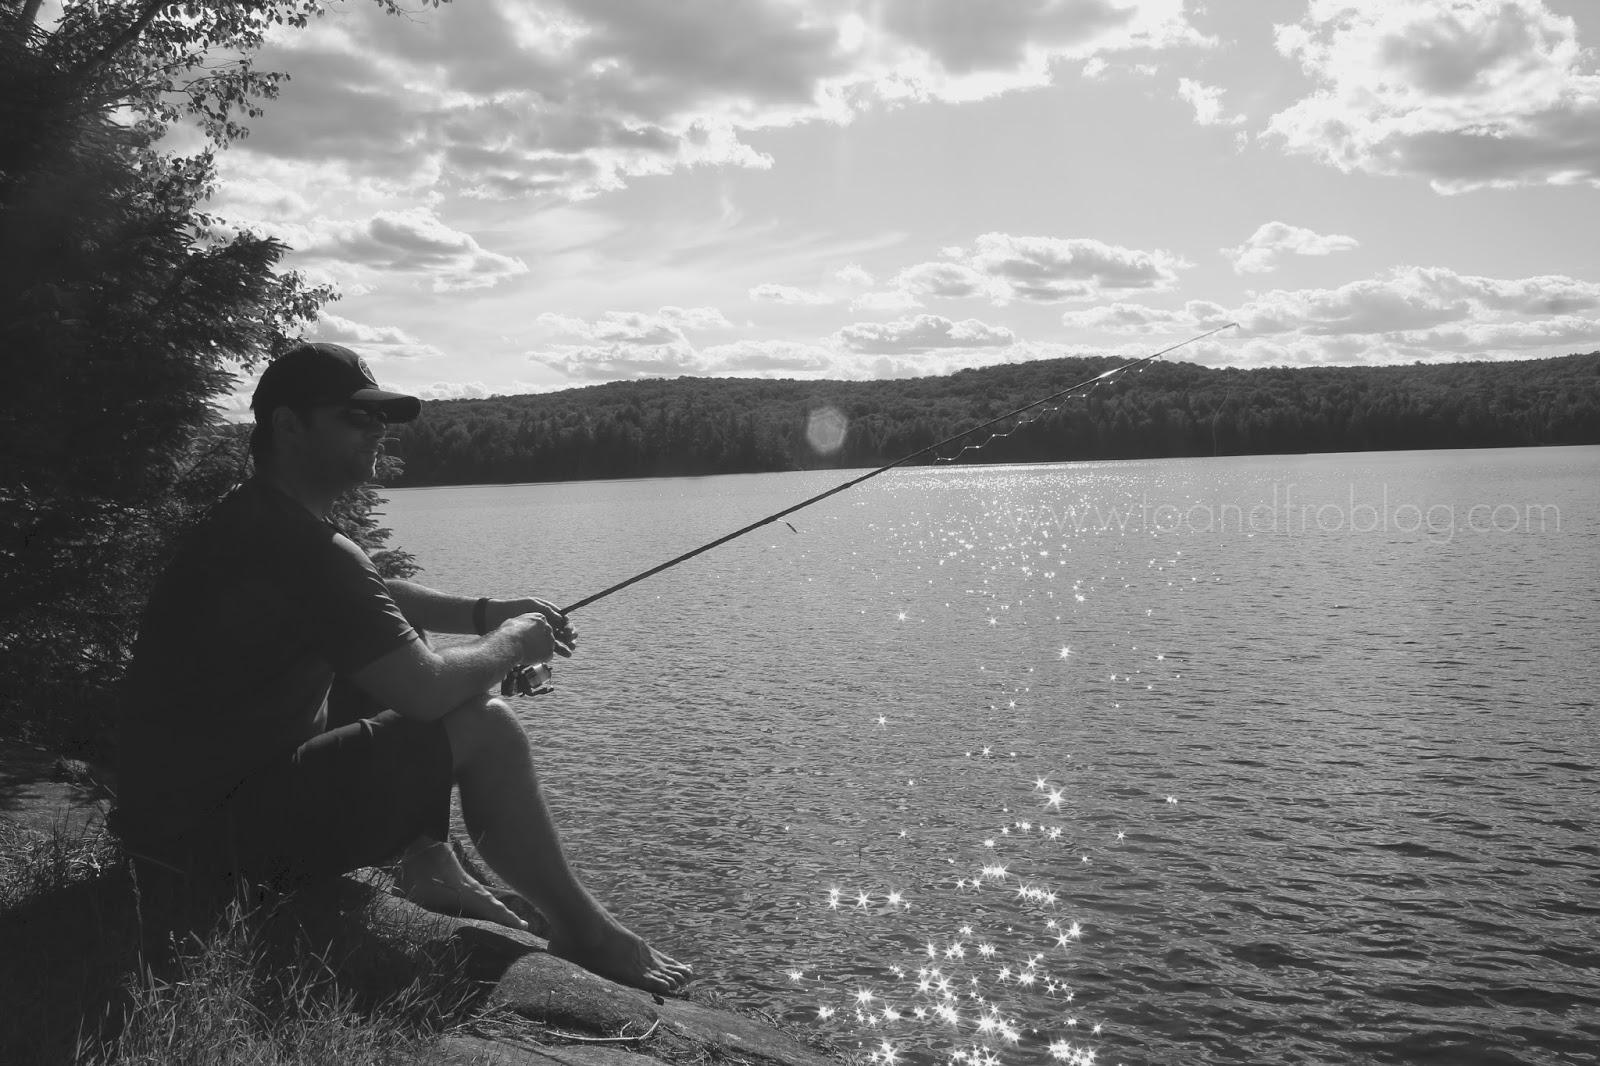 fishing in algonquin provincial park, ontario canada